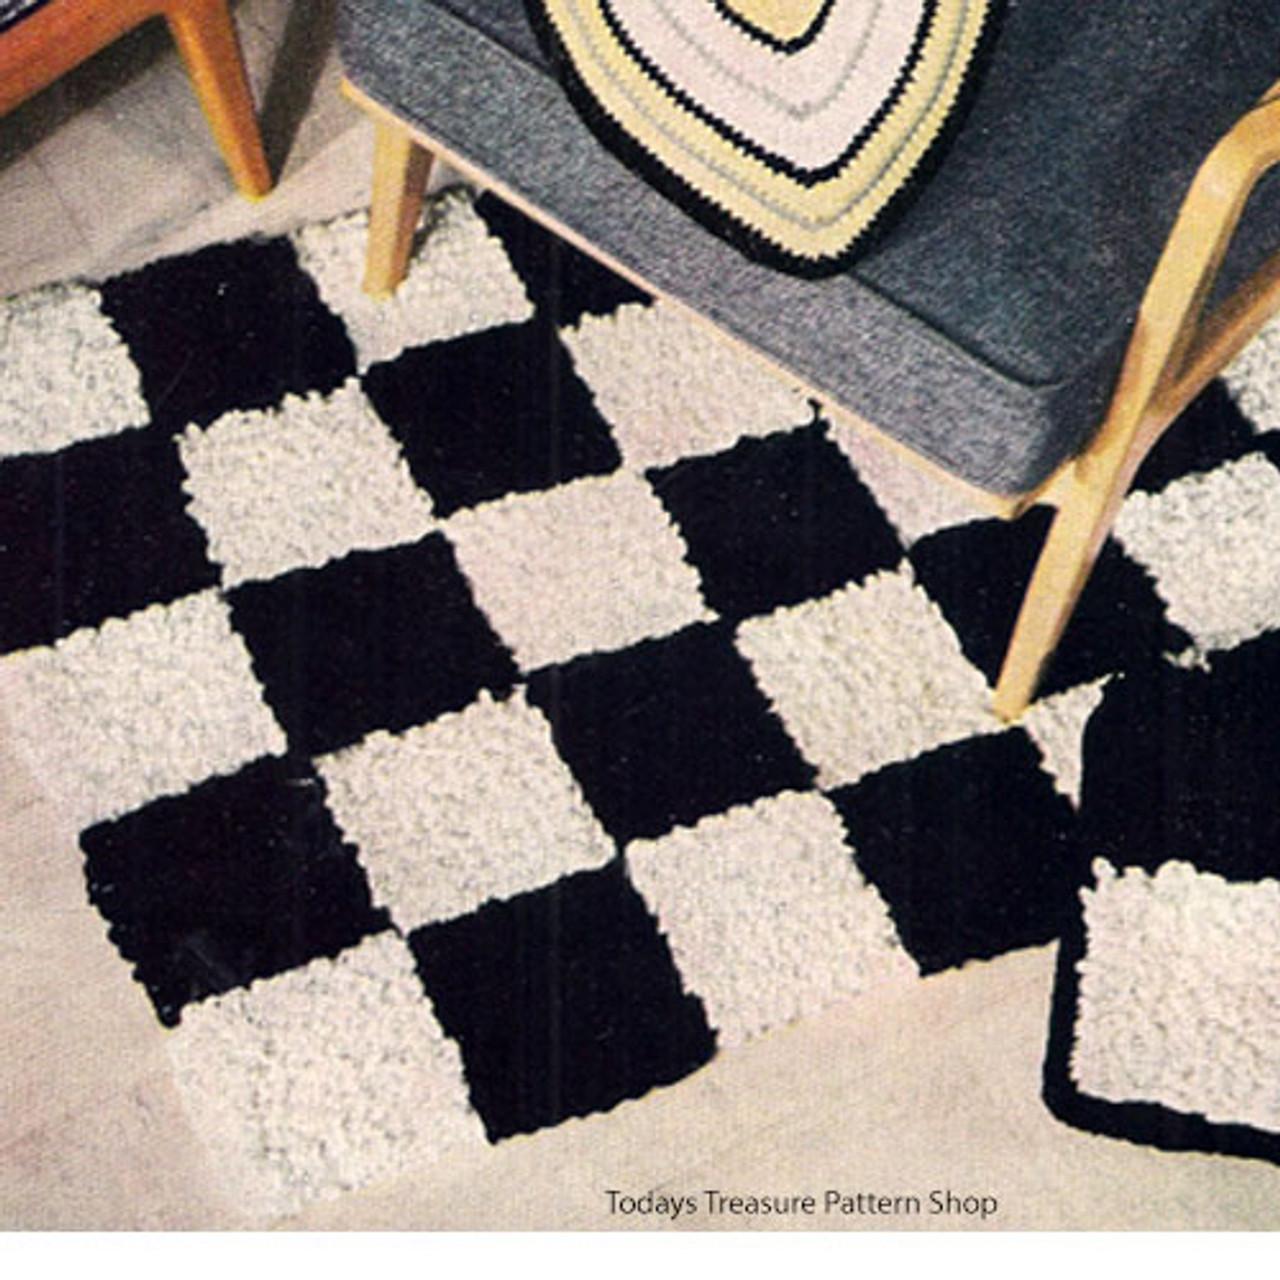 Black & White Checkerboard Rug pattern, Vintage 1950s